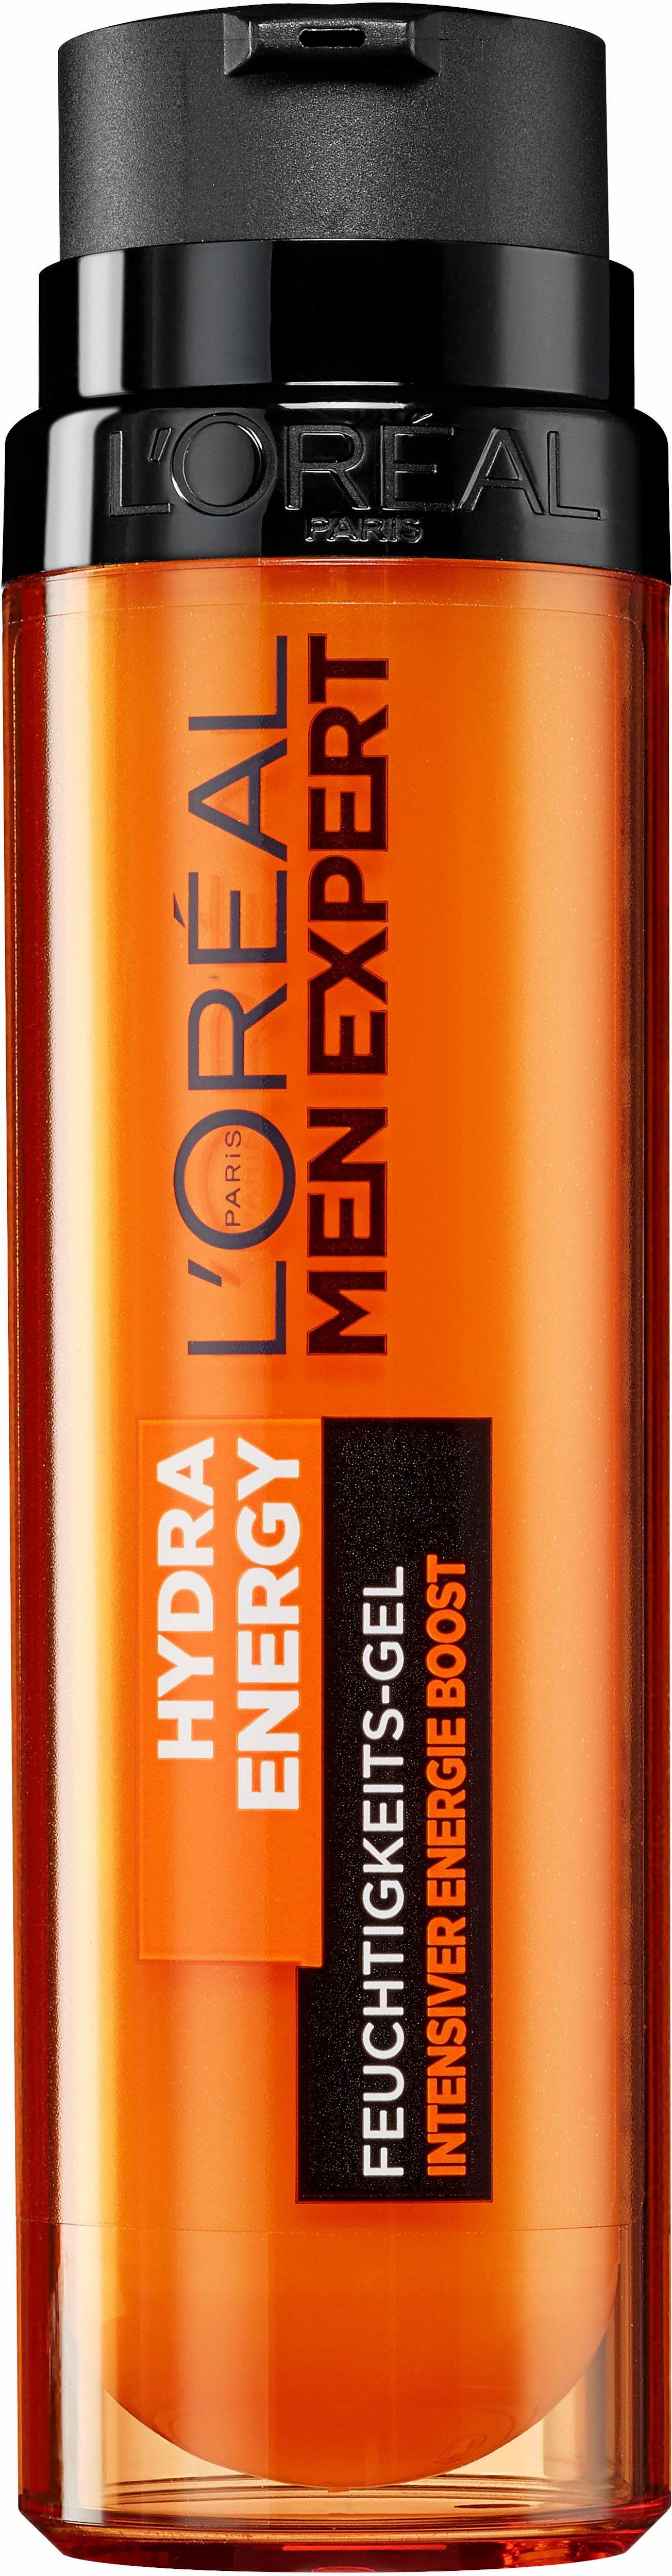 L'Oréal Paris Men Expert, »Hydra Energy Creatin Pflege«, Männerpflege